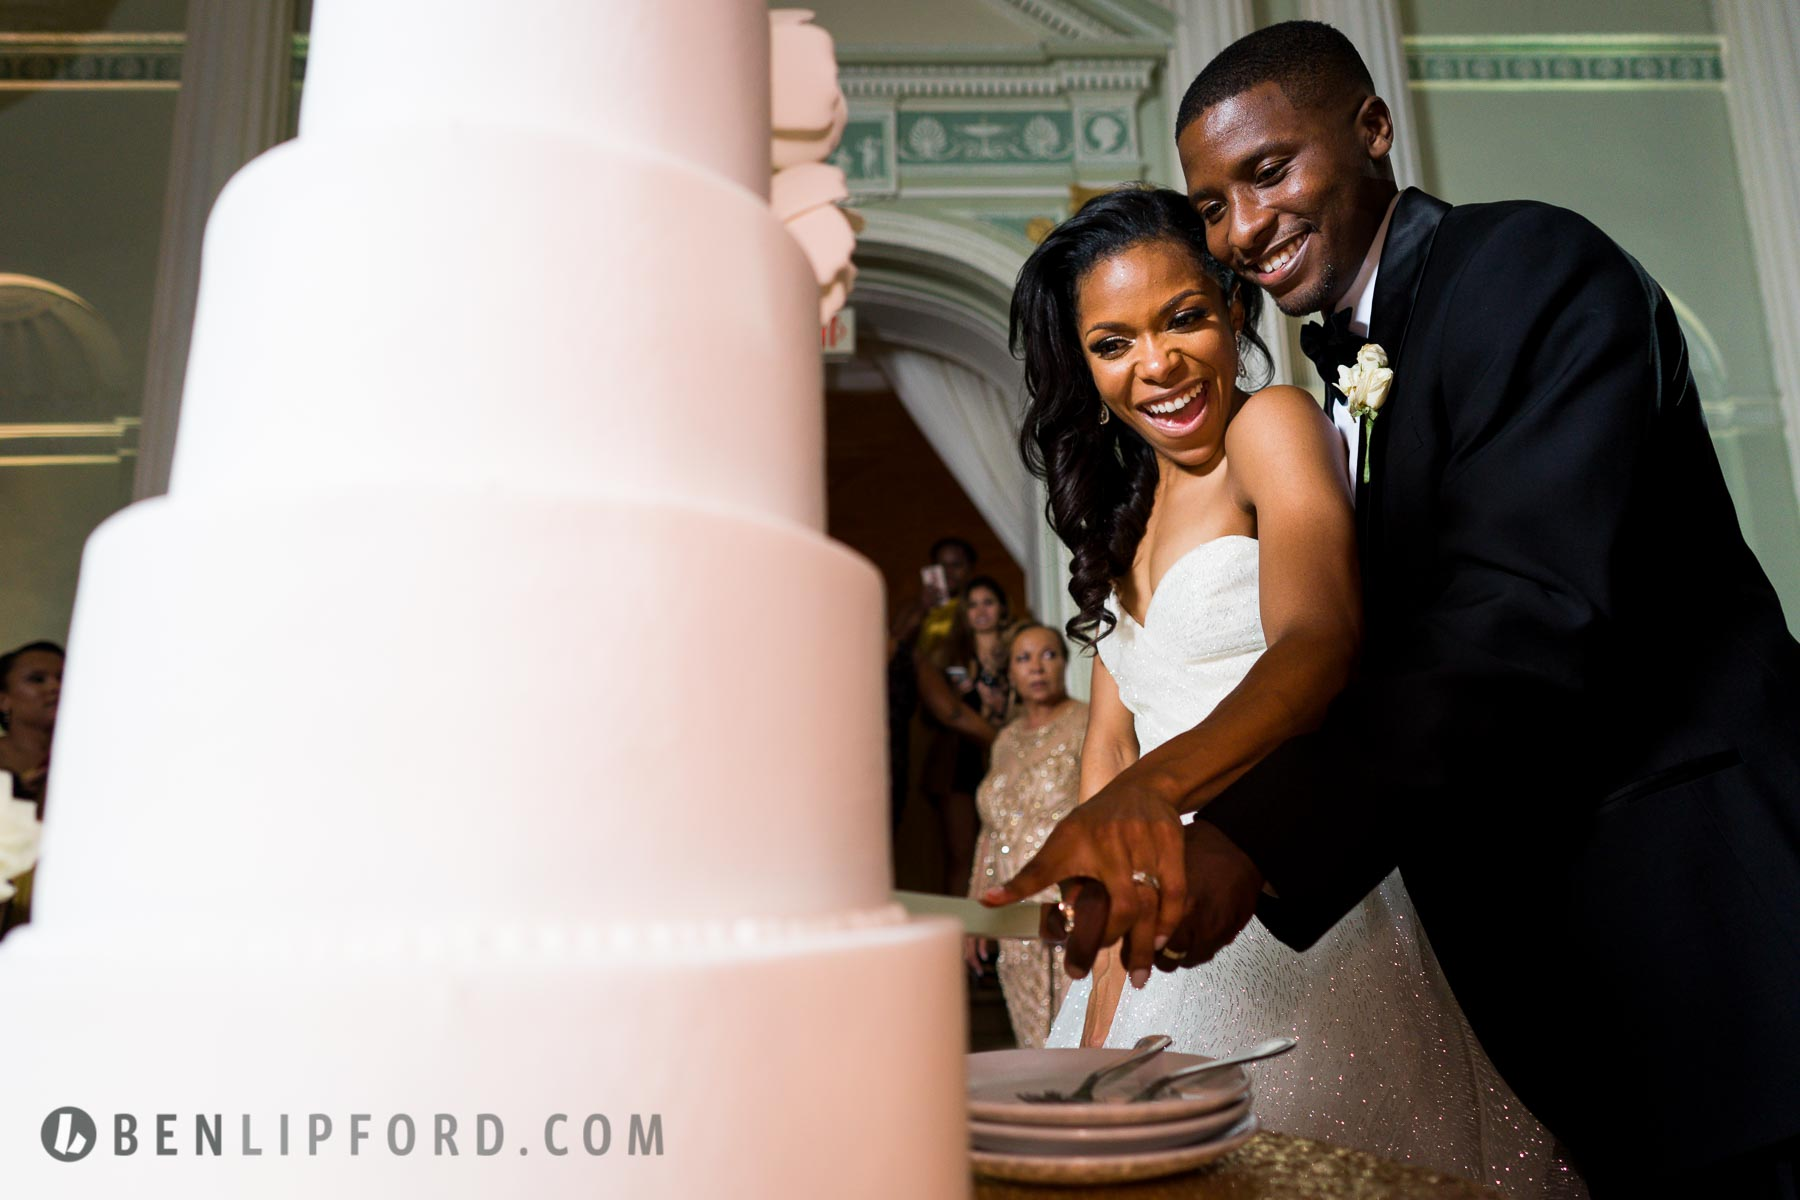 Cameron Jordan Wedding (19 of 24).jpg